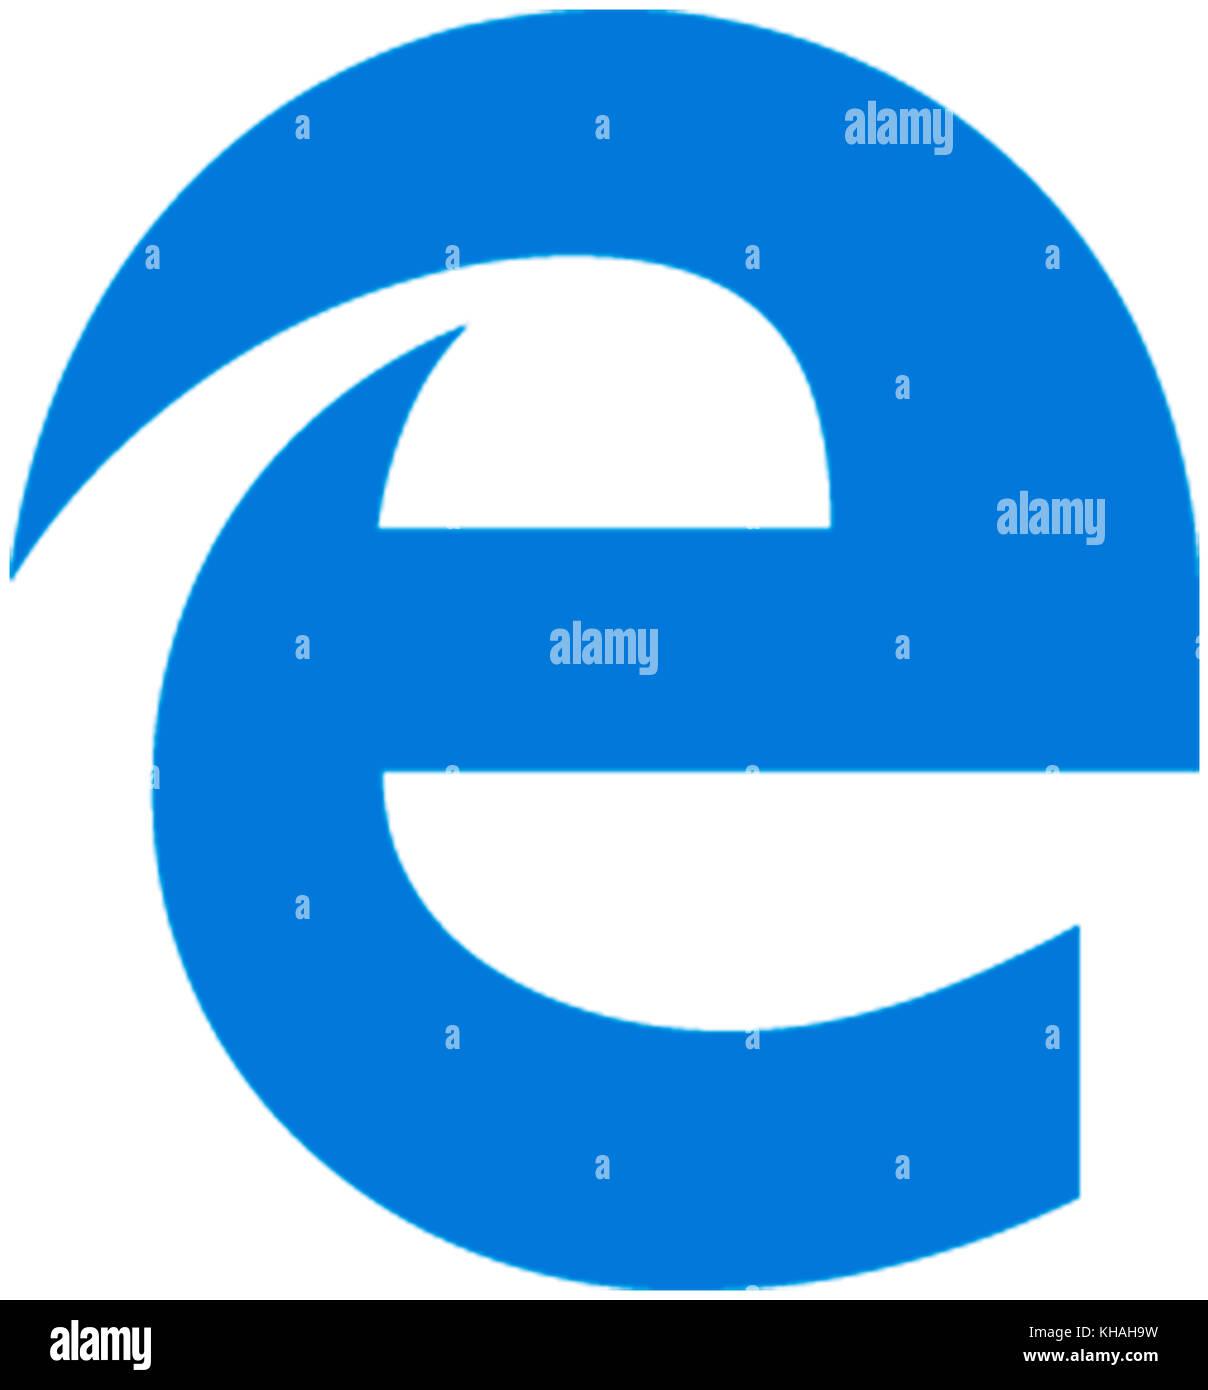 El logotipo de internet explorer, el navegador de microsoft Imagen De Stock